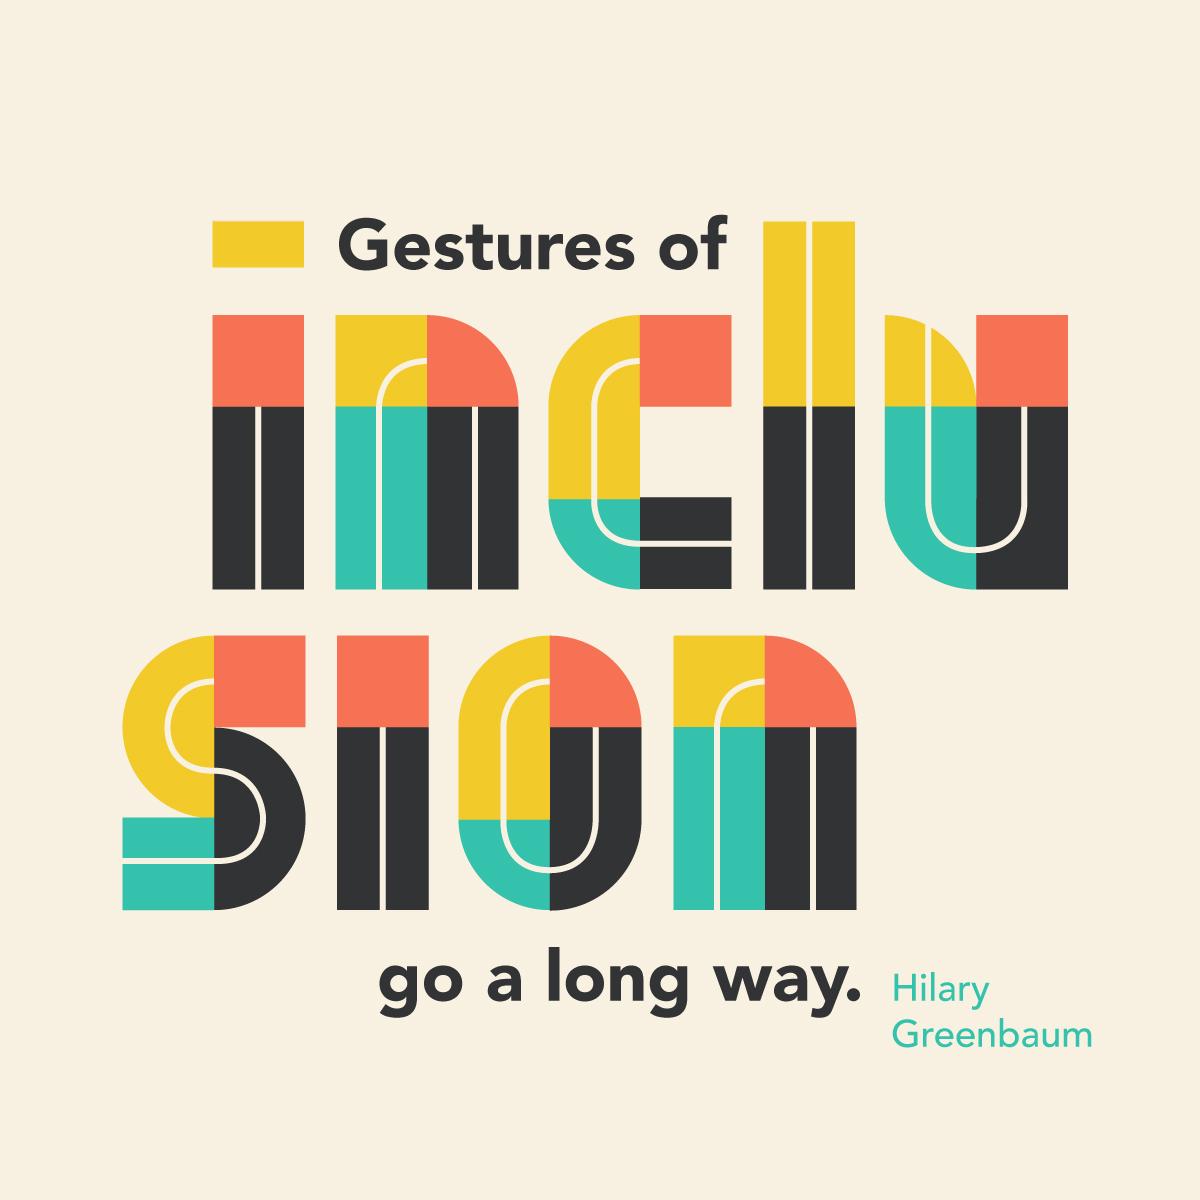 """Gestures of inclusion go a long way."" Hilary Greenbaum"